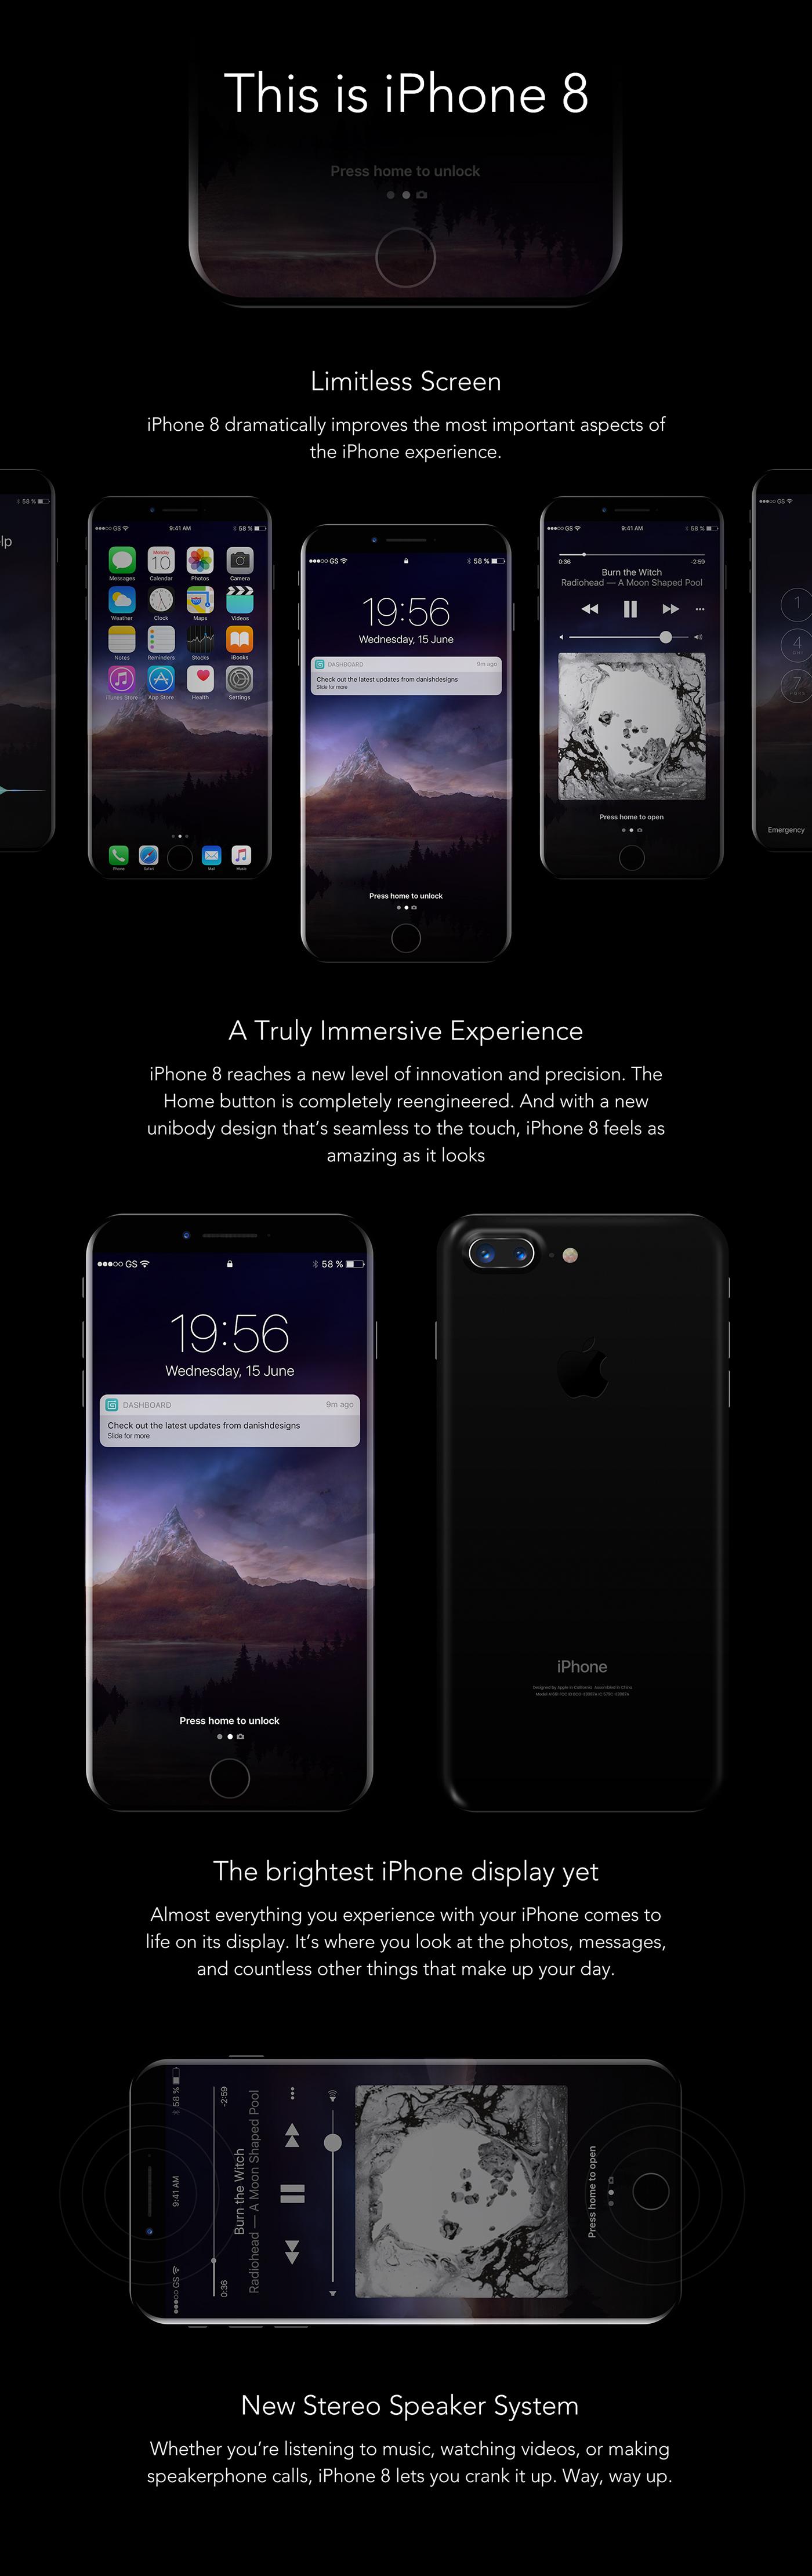 iPhone 8 Mockup iphone iphone8 landing page Mockup psd freedownload